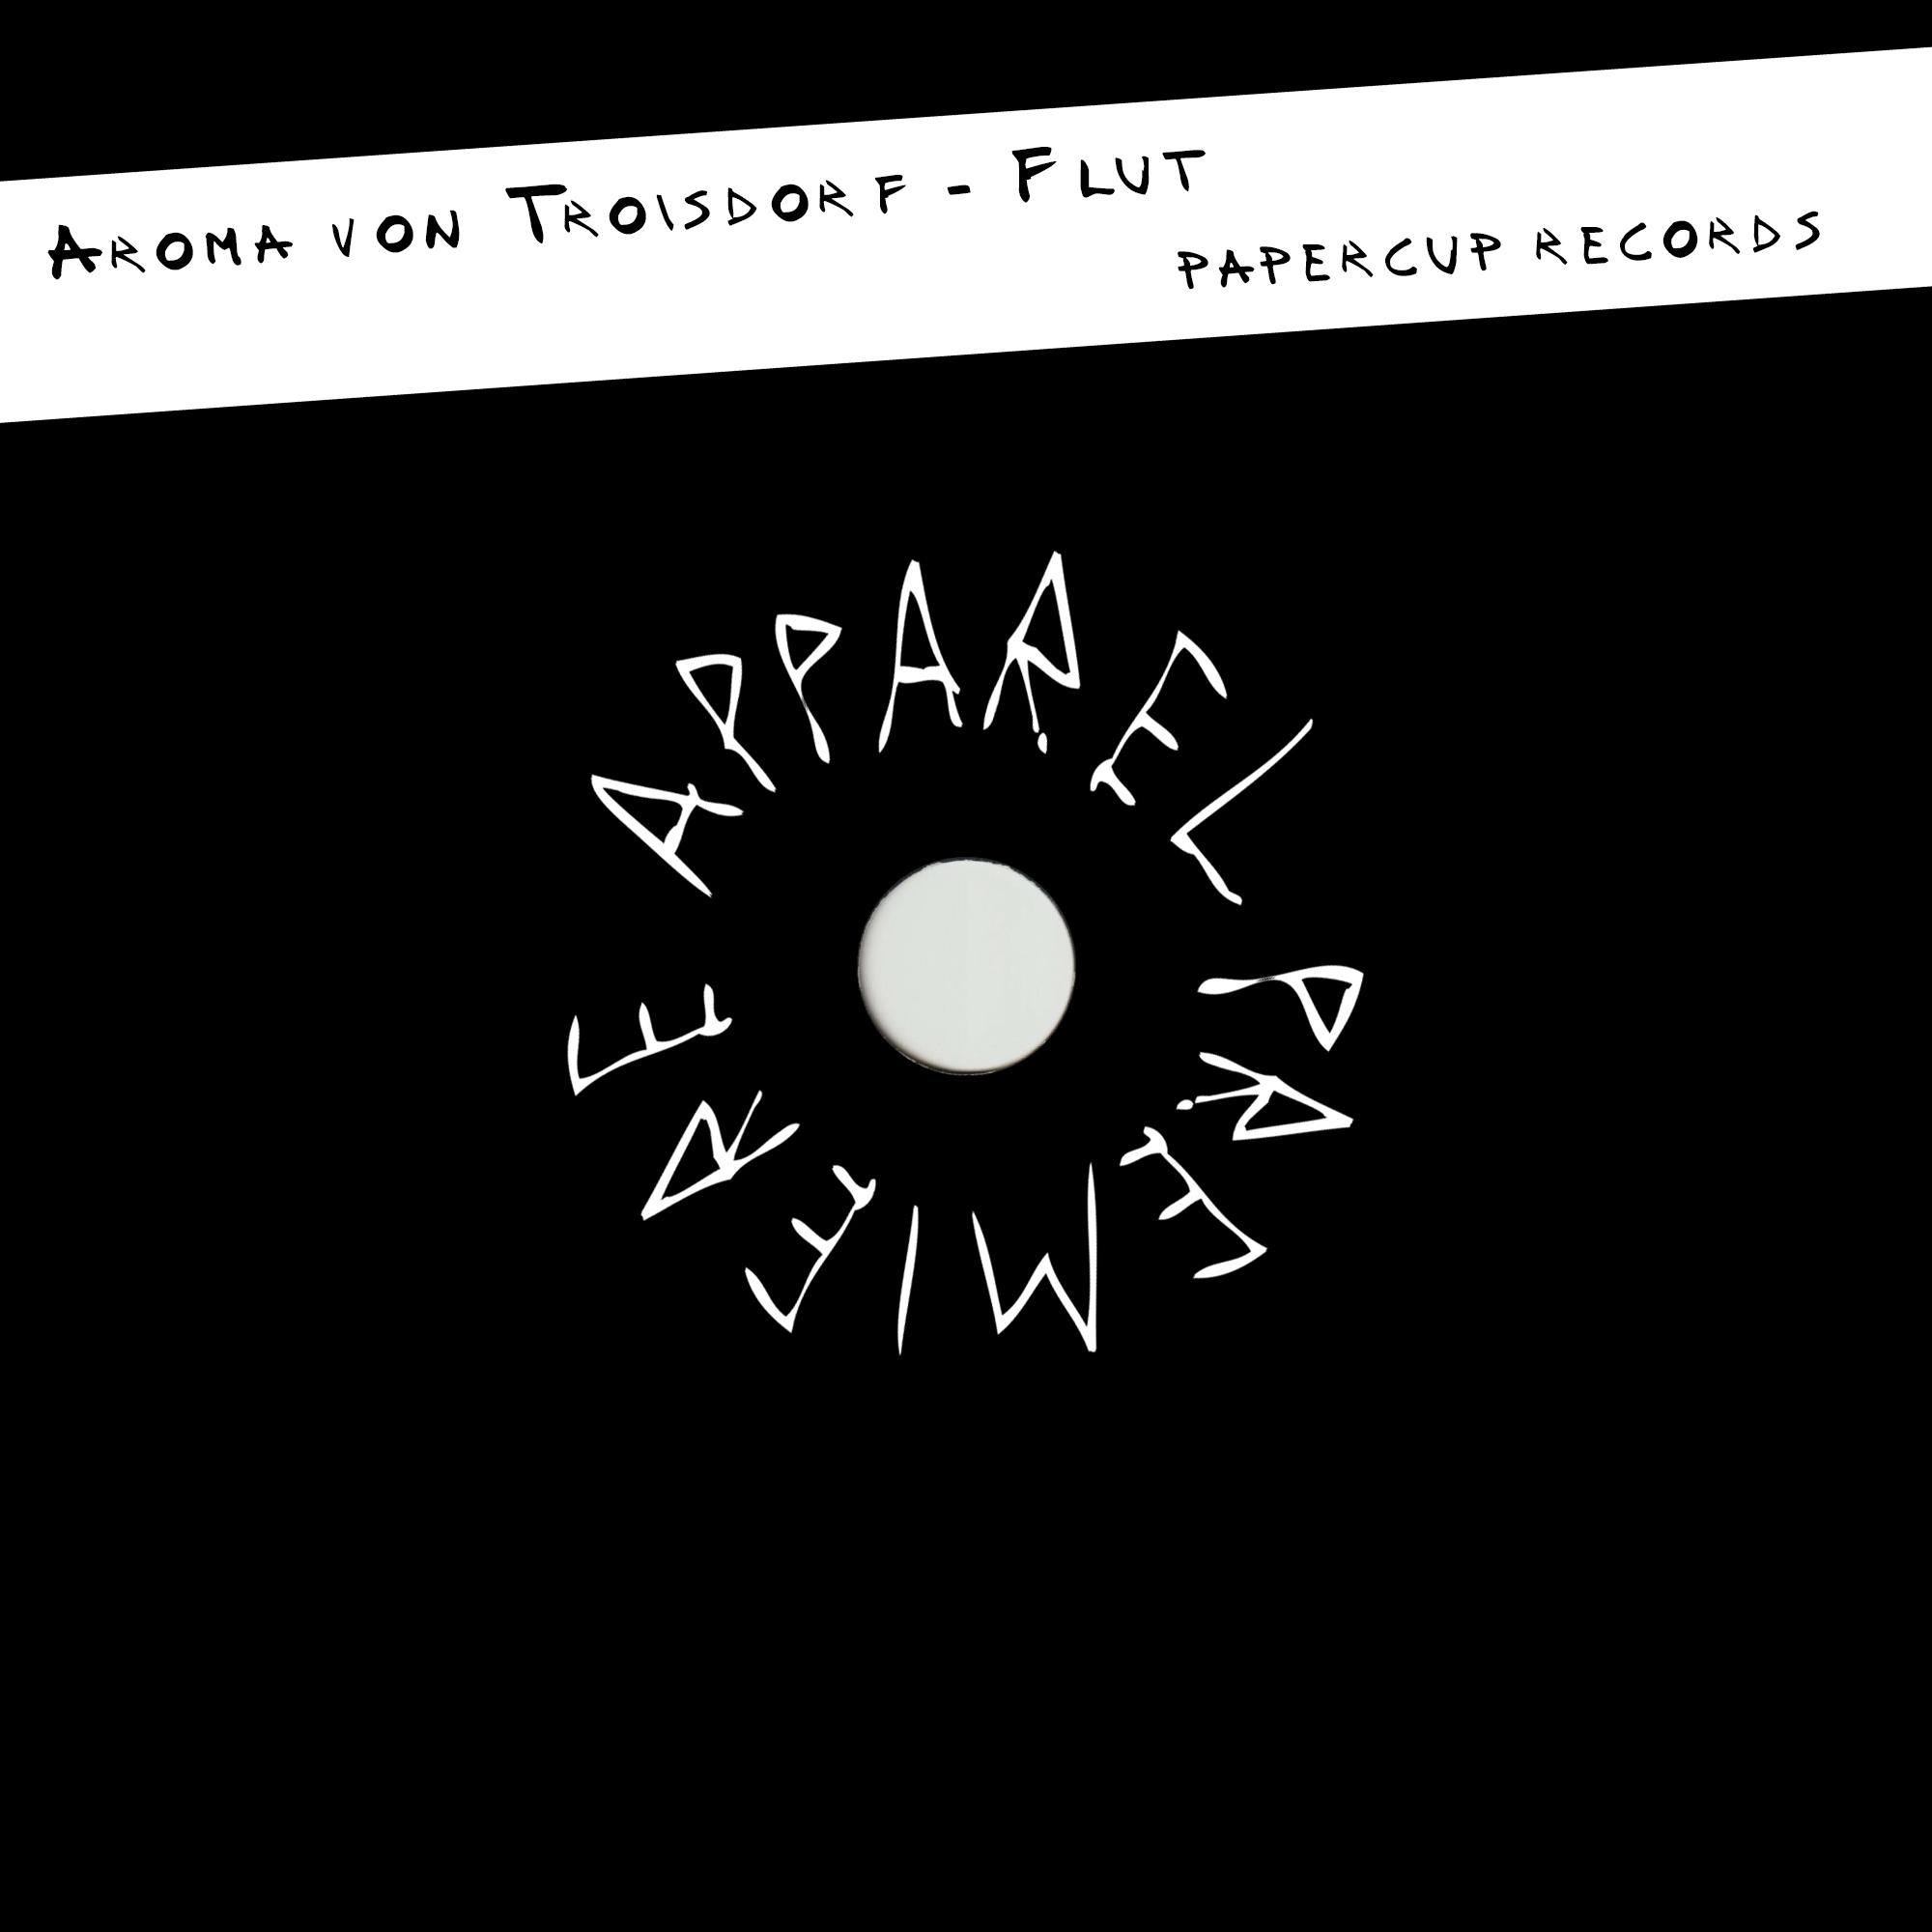 APPAREL PREMIERE Aroma von Troisdorf – Flut [Papercup Records]